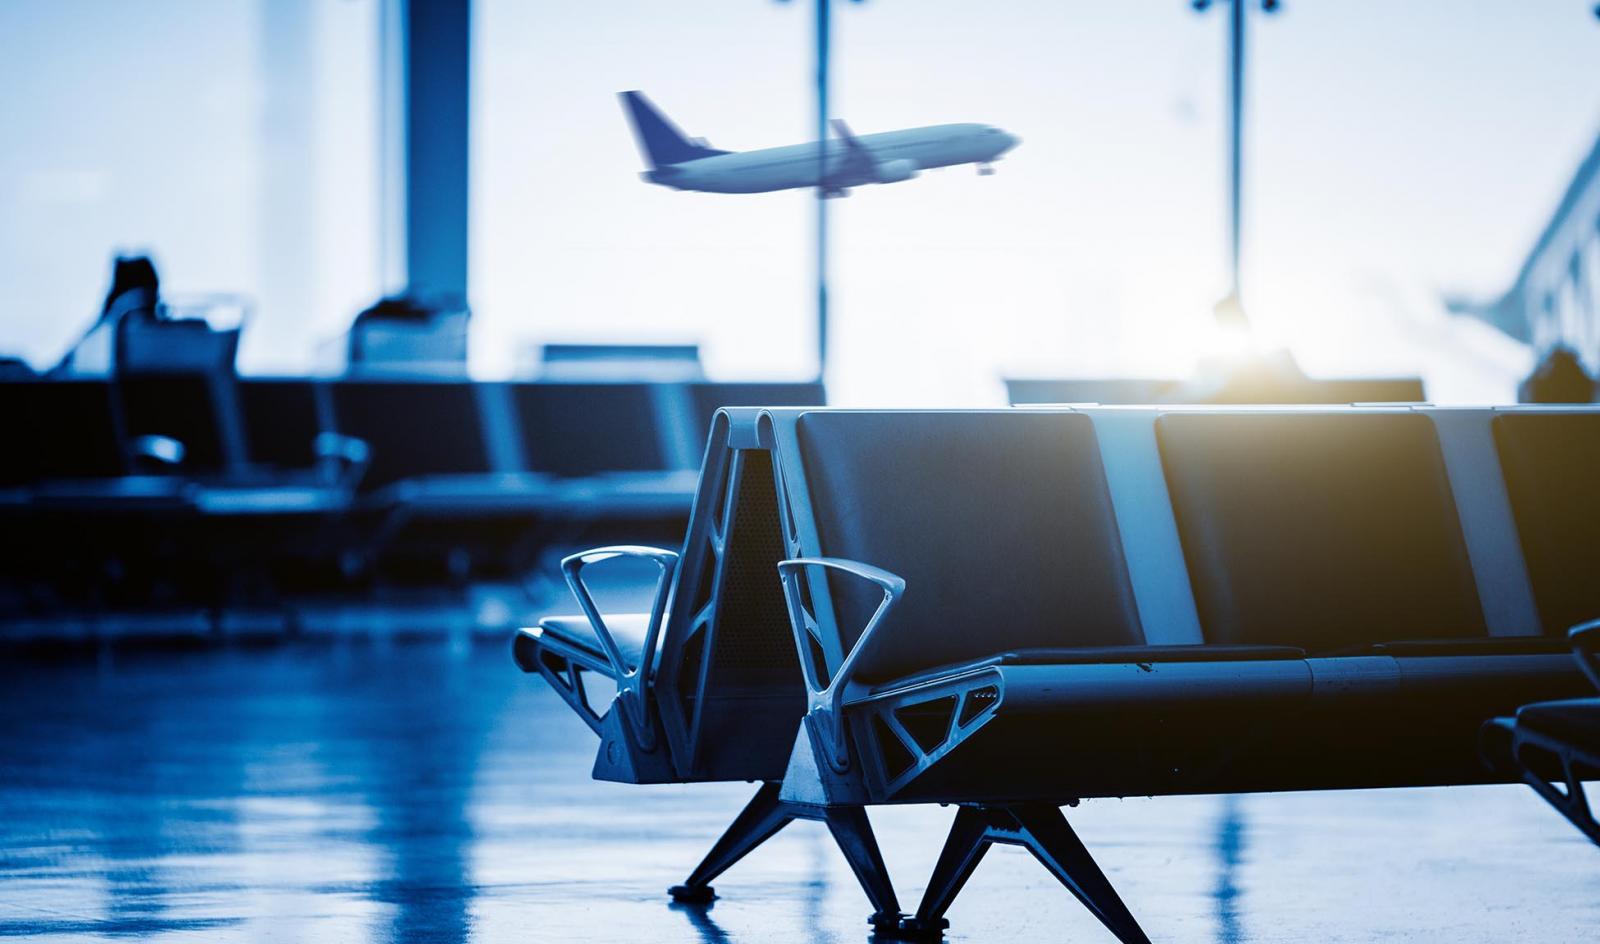 ᐅ Die Besten London Heathrow Transfers 2019 Lhr